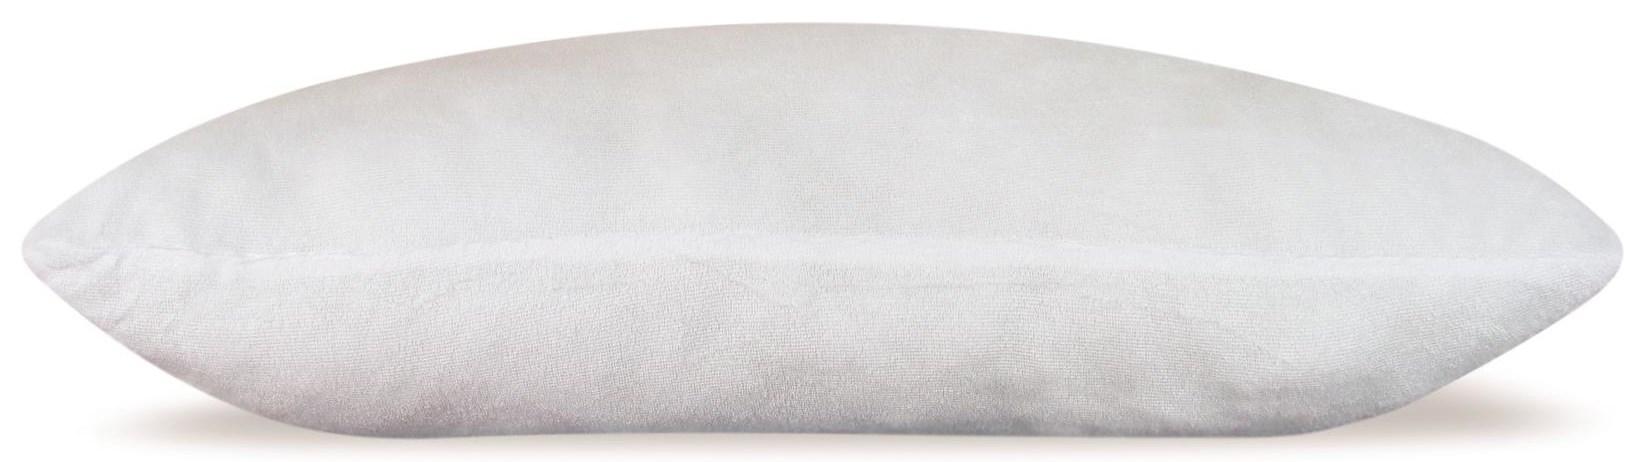 Sleep Rite King Pillow by UV3 Masterguard at Sam Levitz Furniture